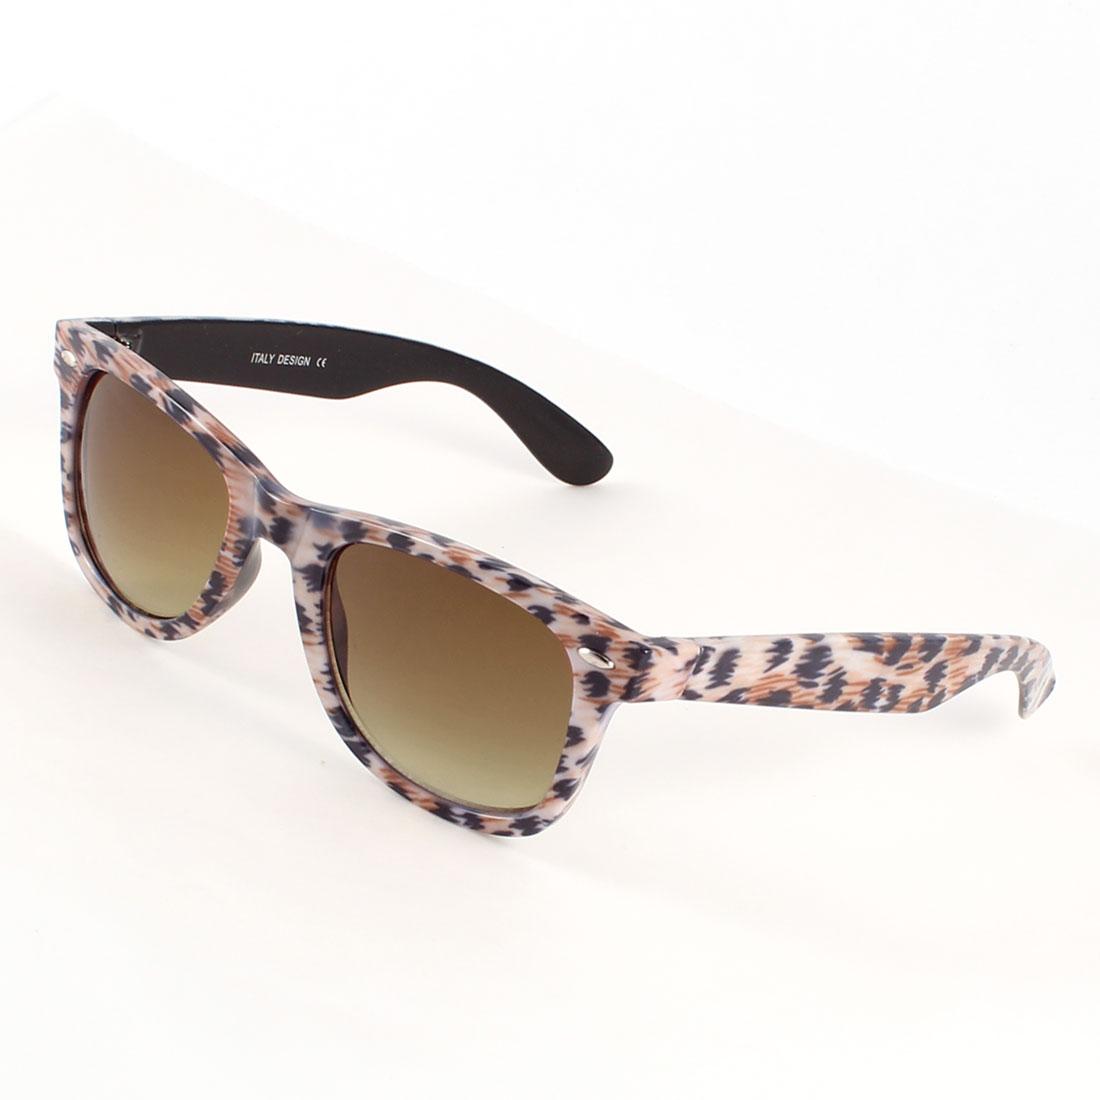 Raindrop Shape Brown Lens White Black Plastic Frame Sunglasses for Lady